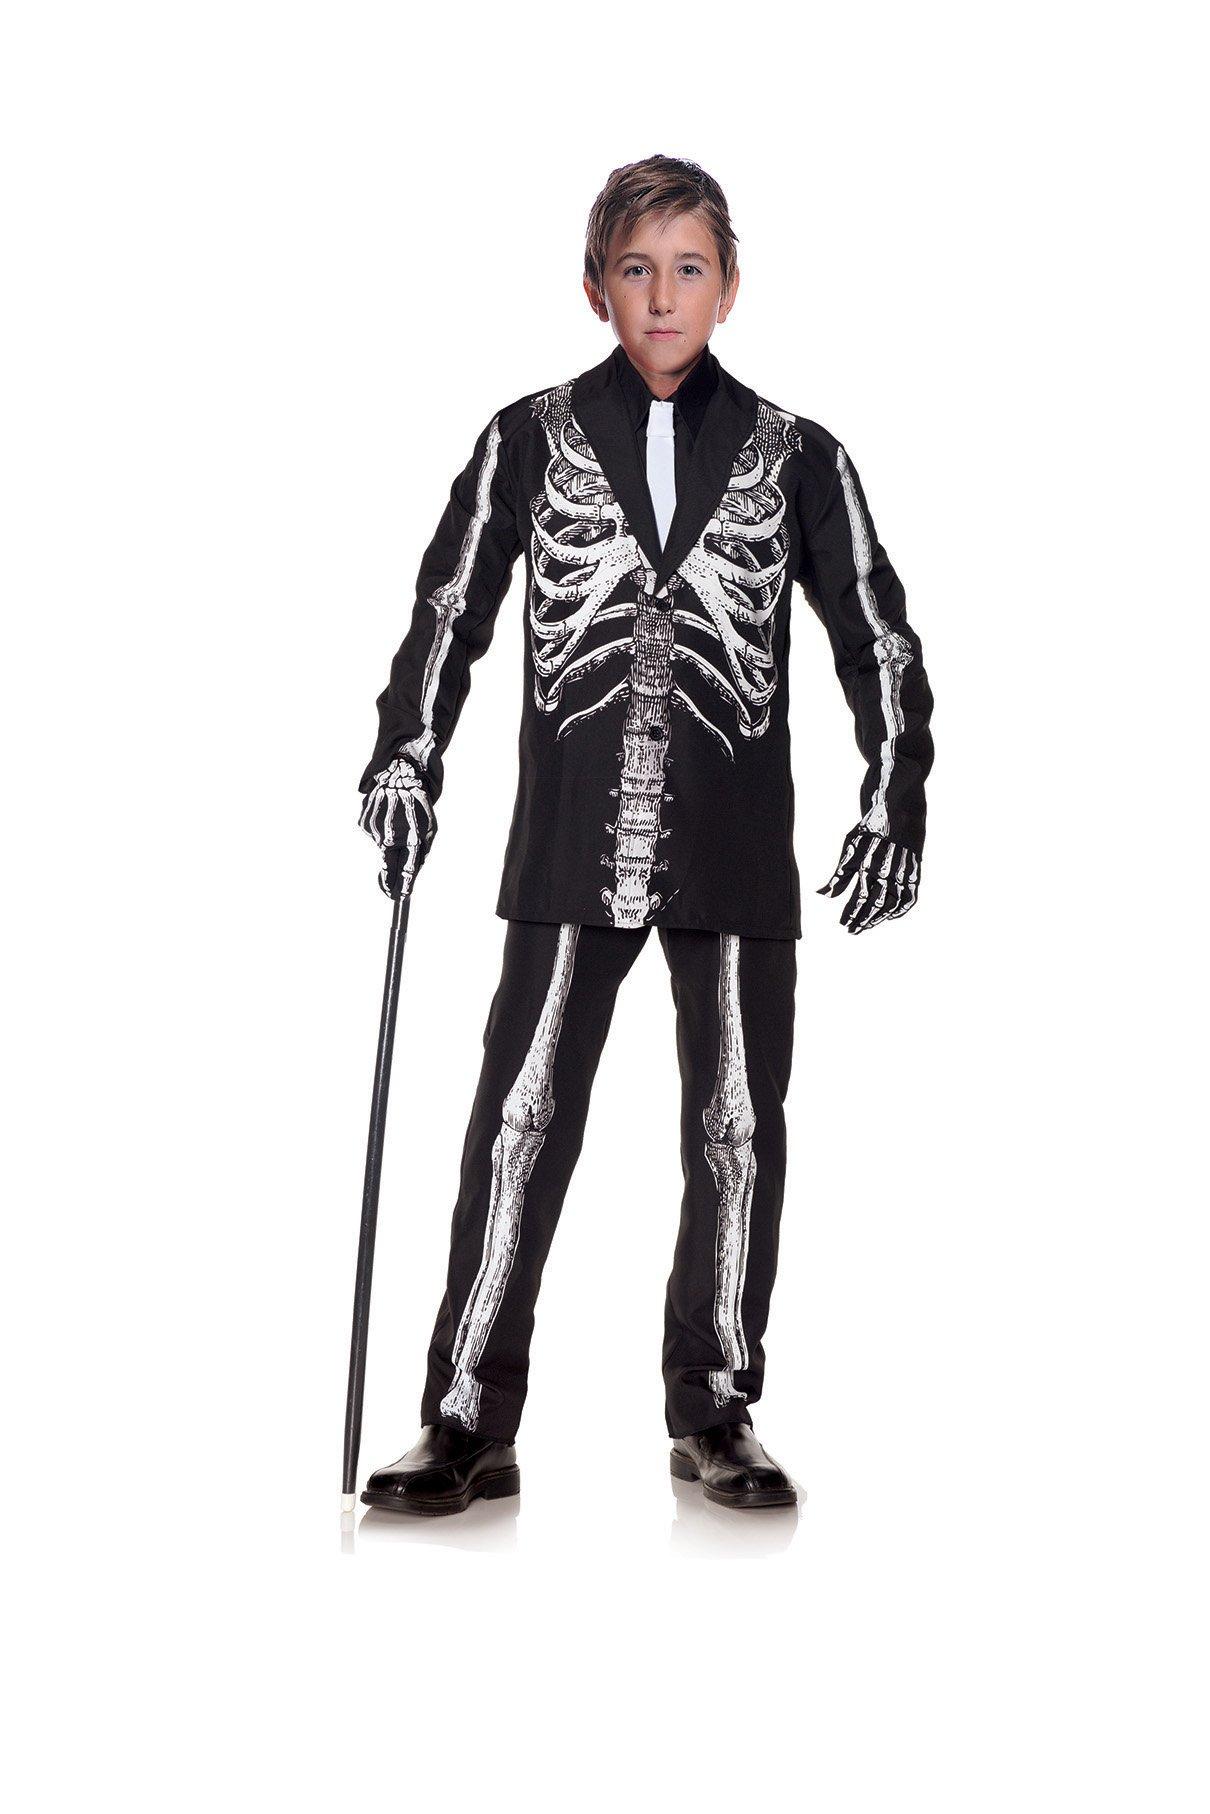 Underwraps Little Boy's Skeleton Suit Costume by Underwraps (Image #2)